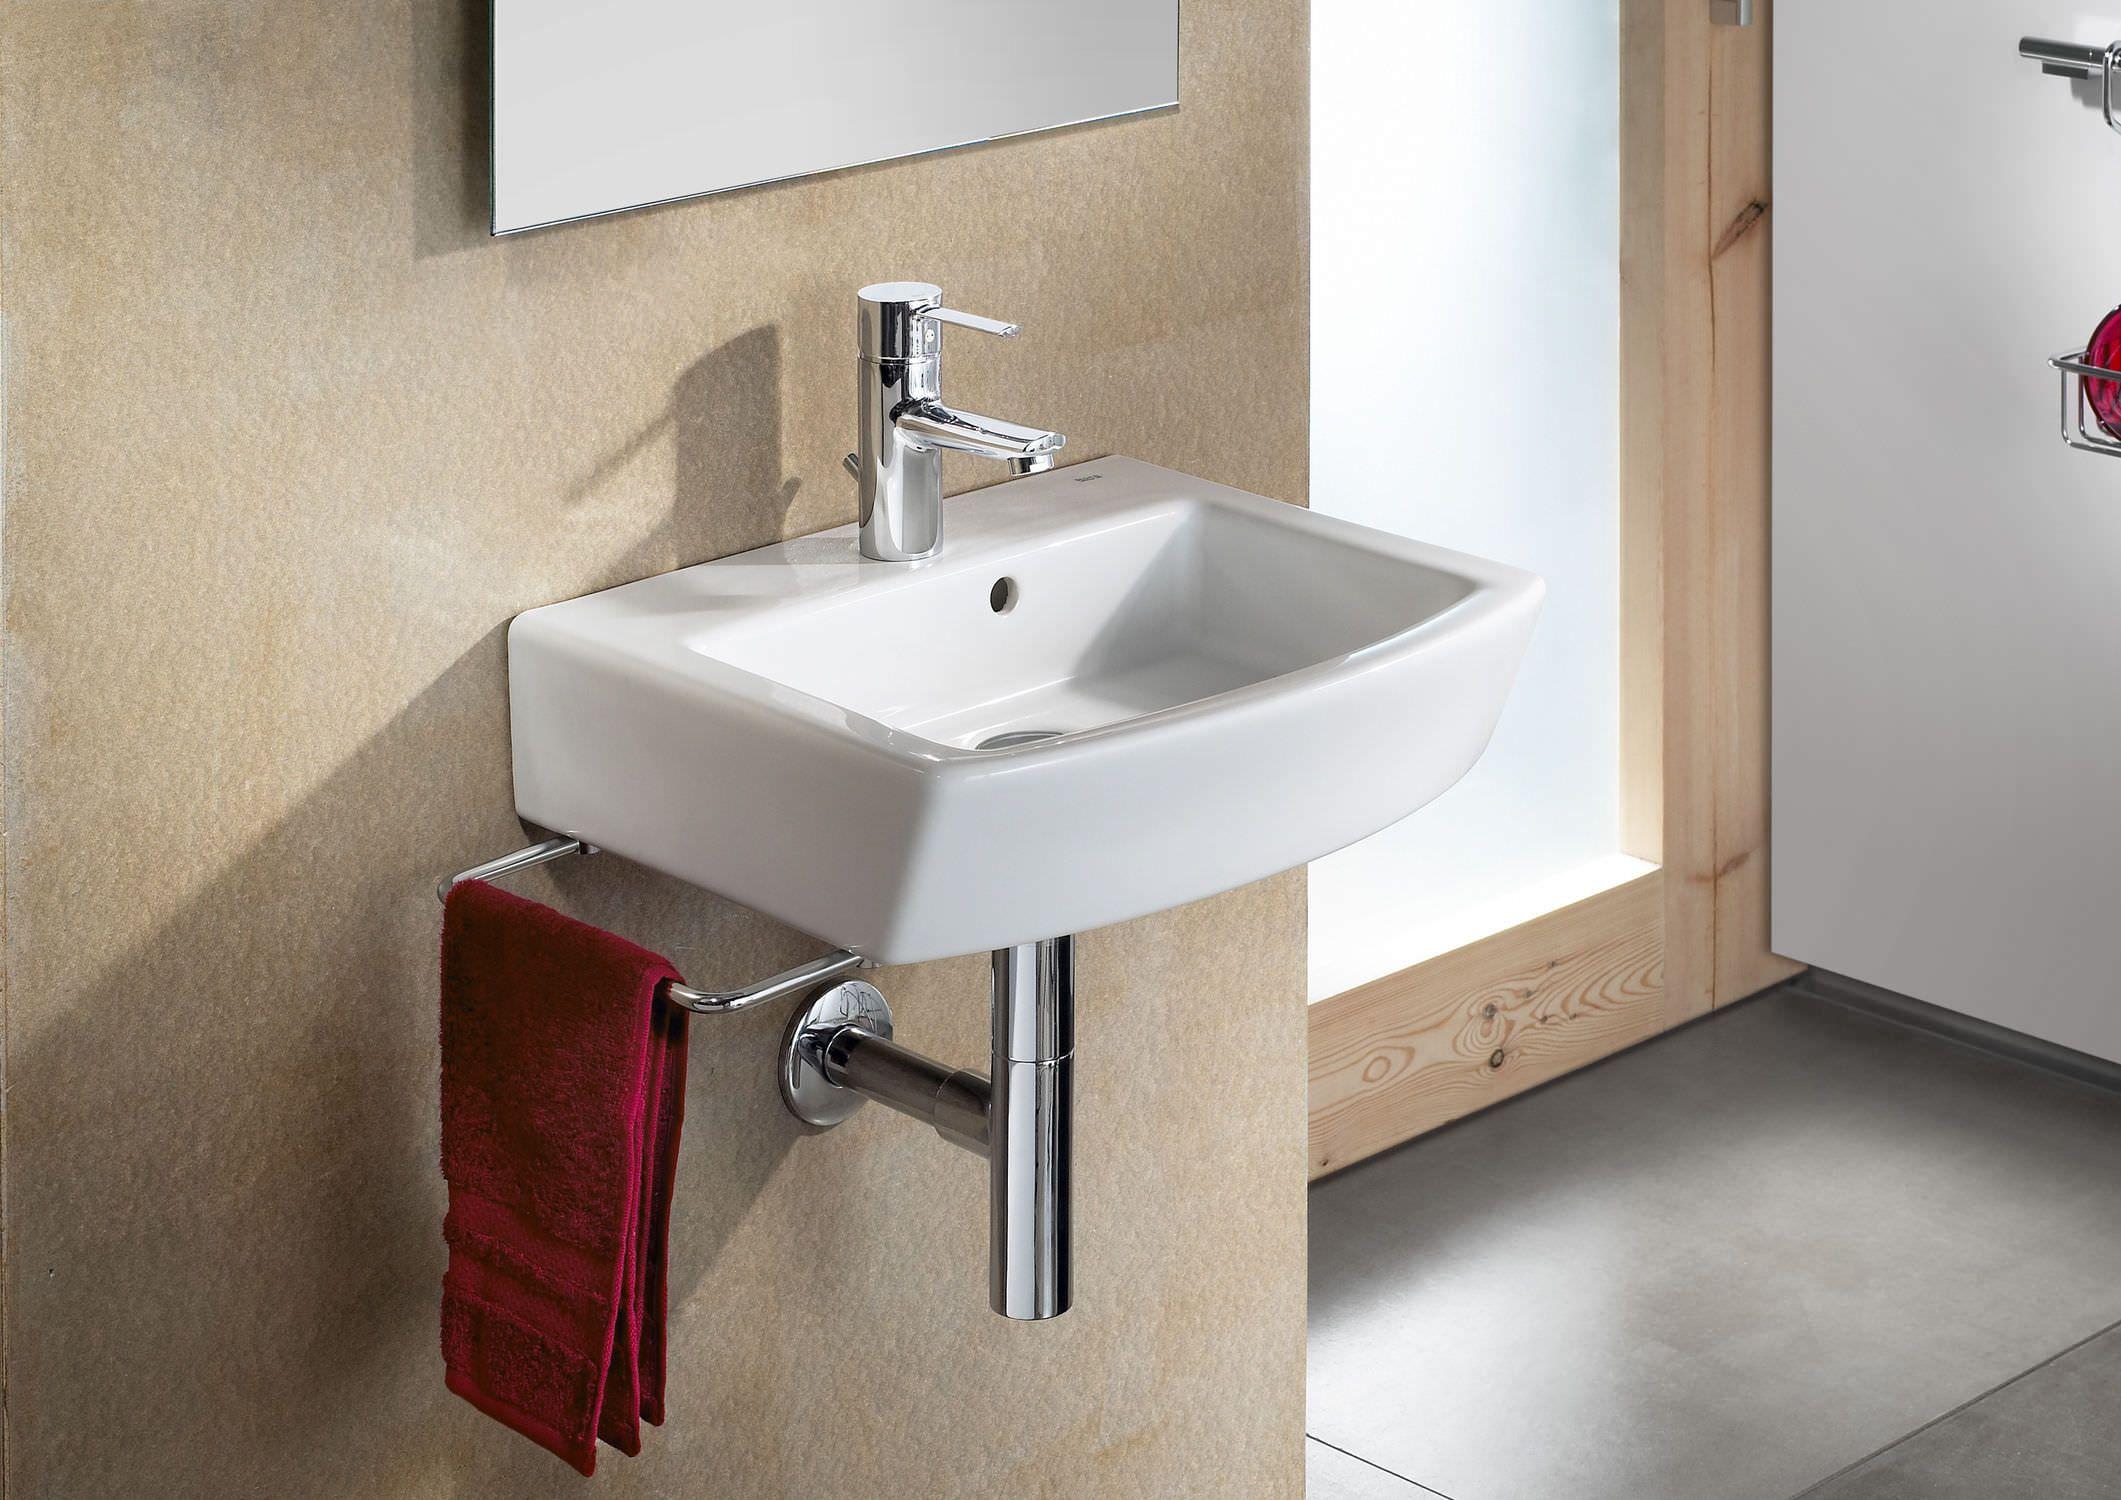 Lavamanos 450 serie hall con toallero bathroom for Lavamanos roca